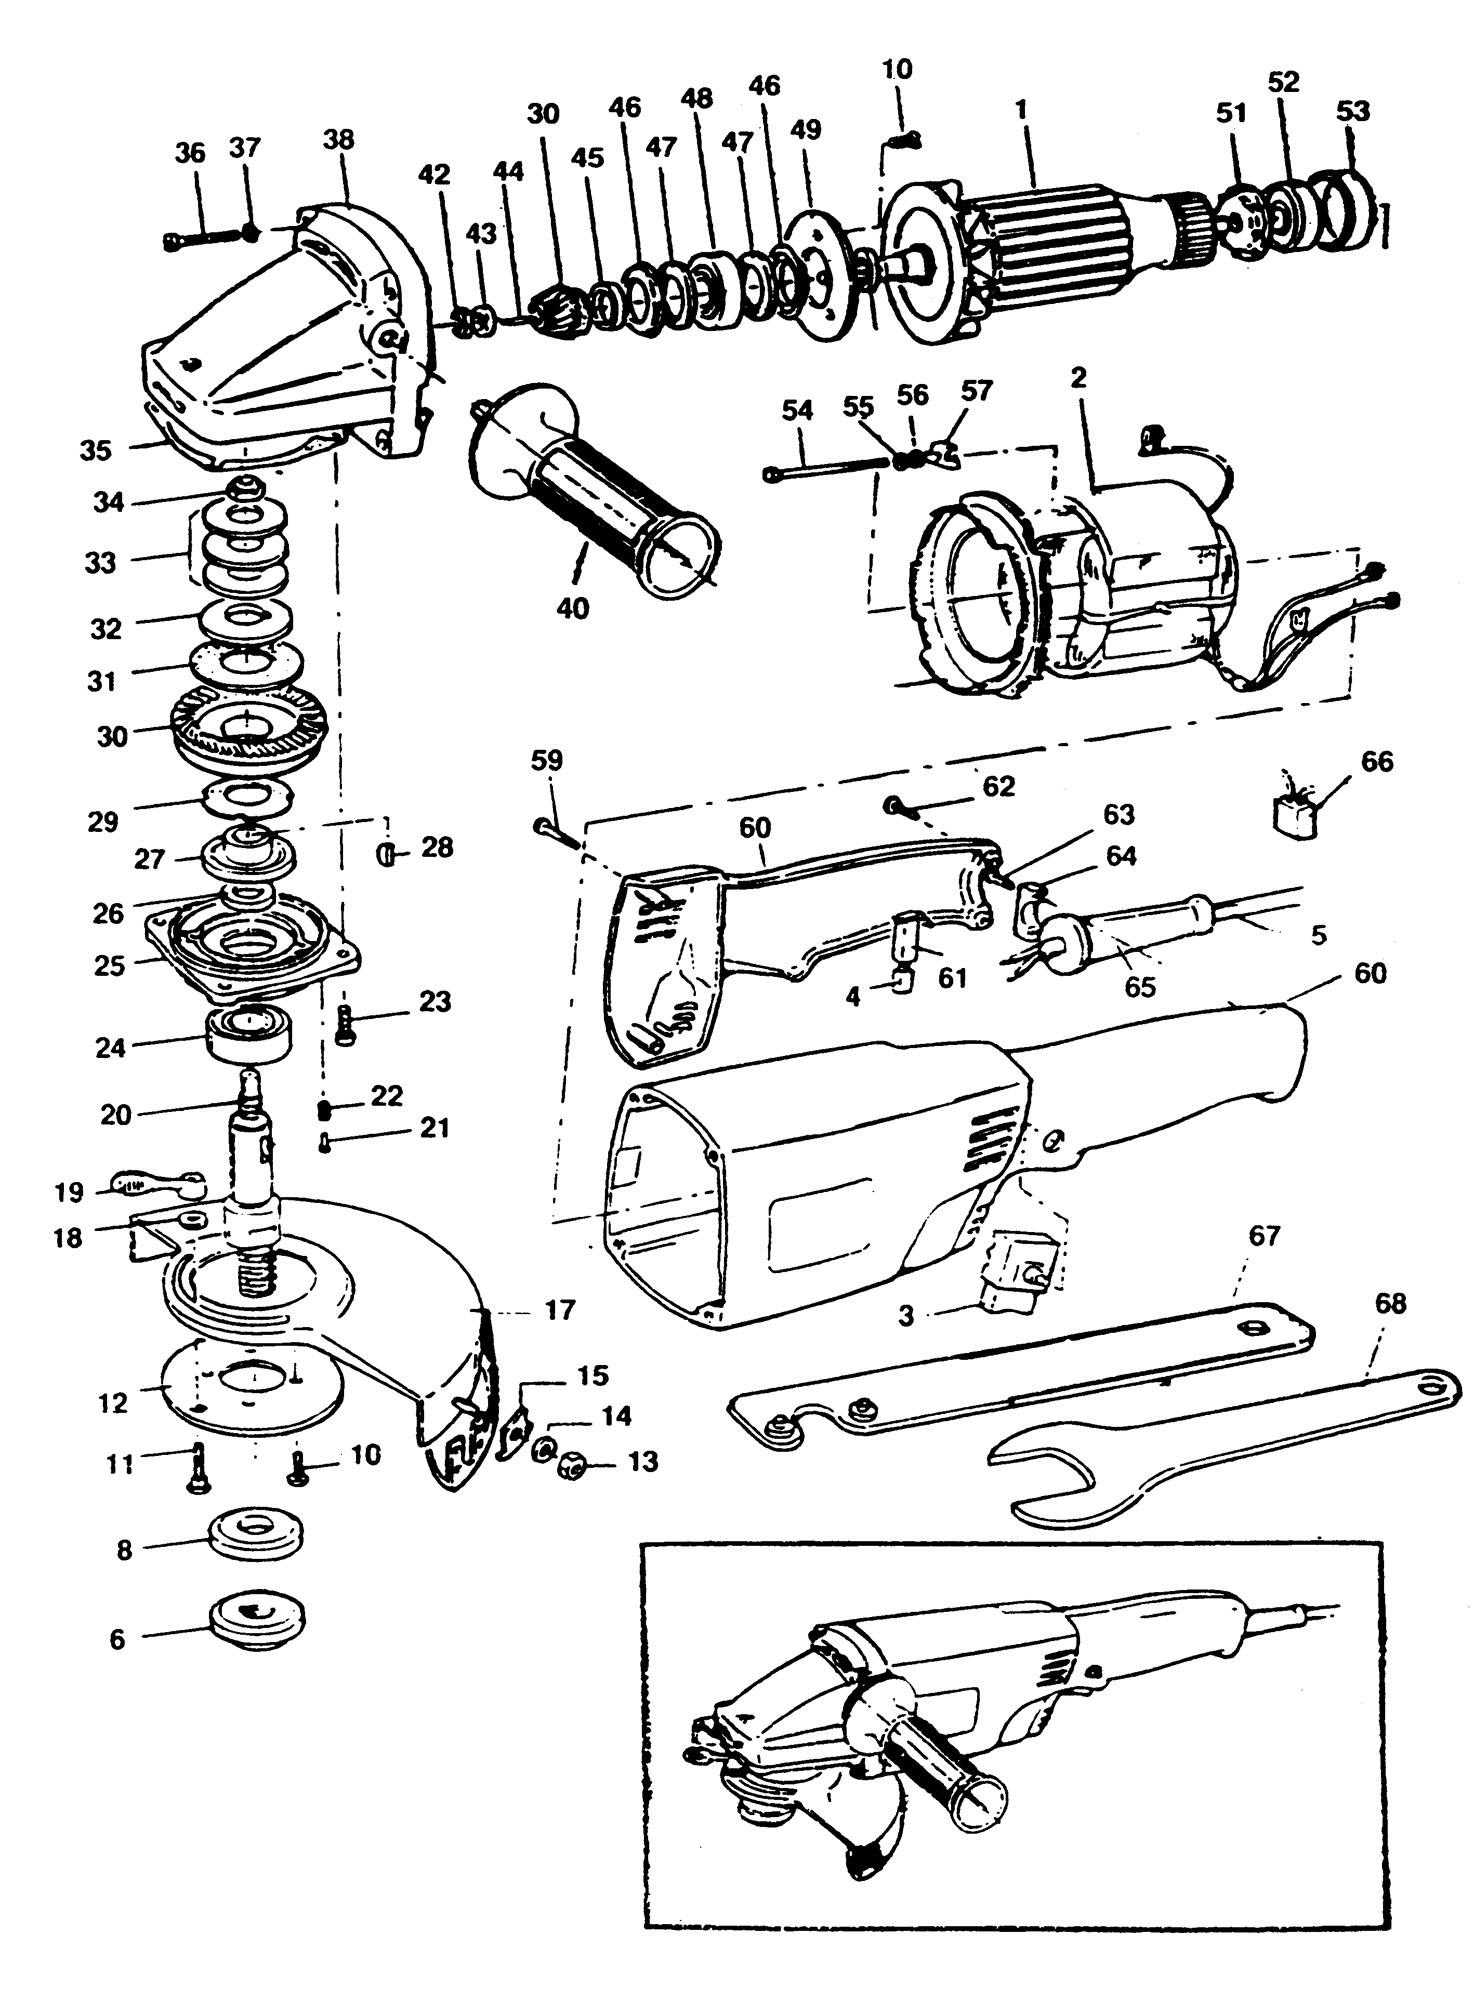 black and decker angle grinder manual